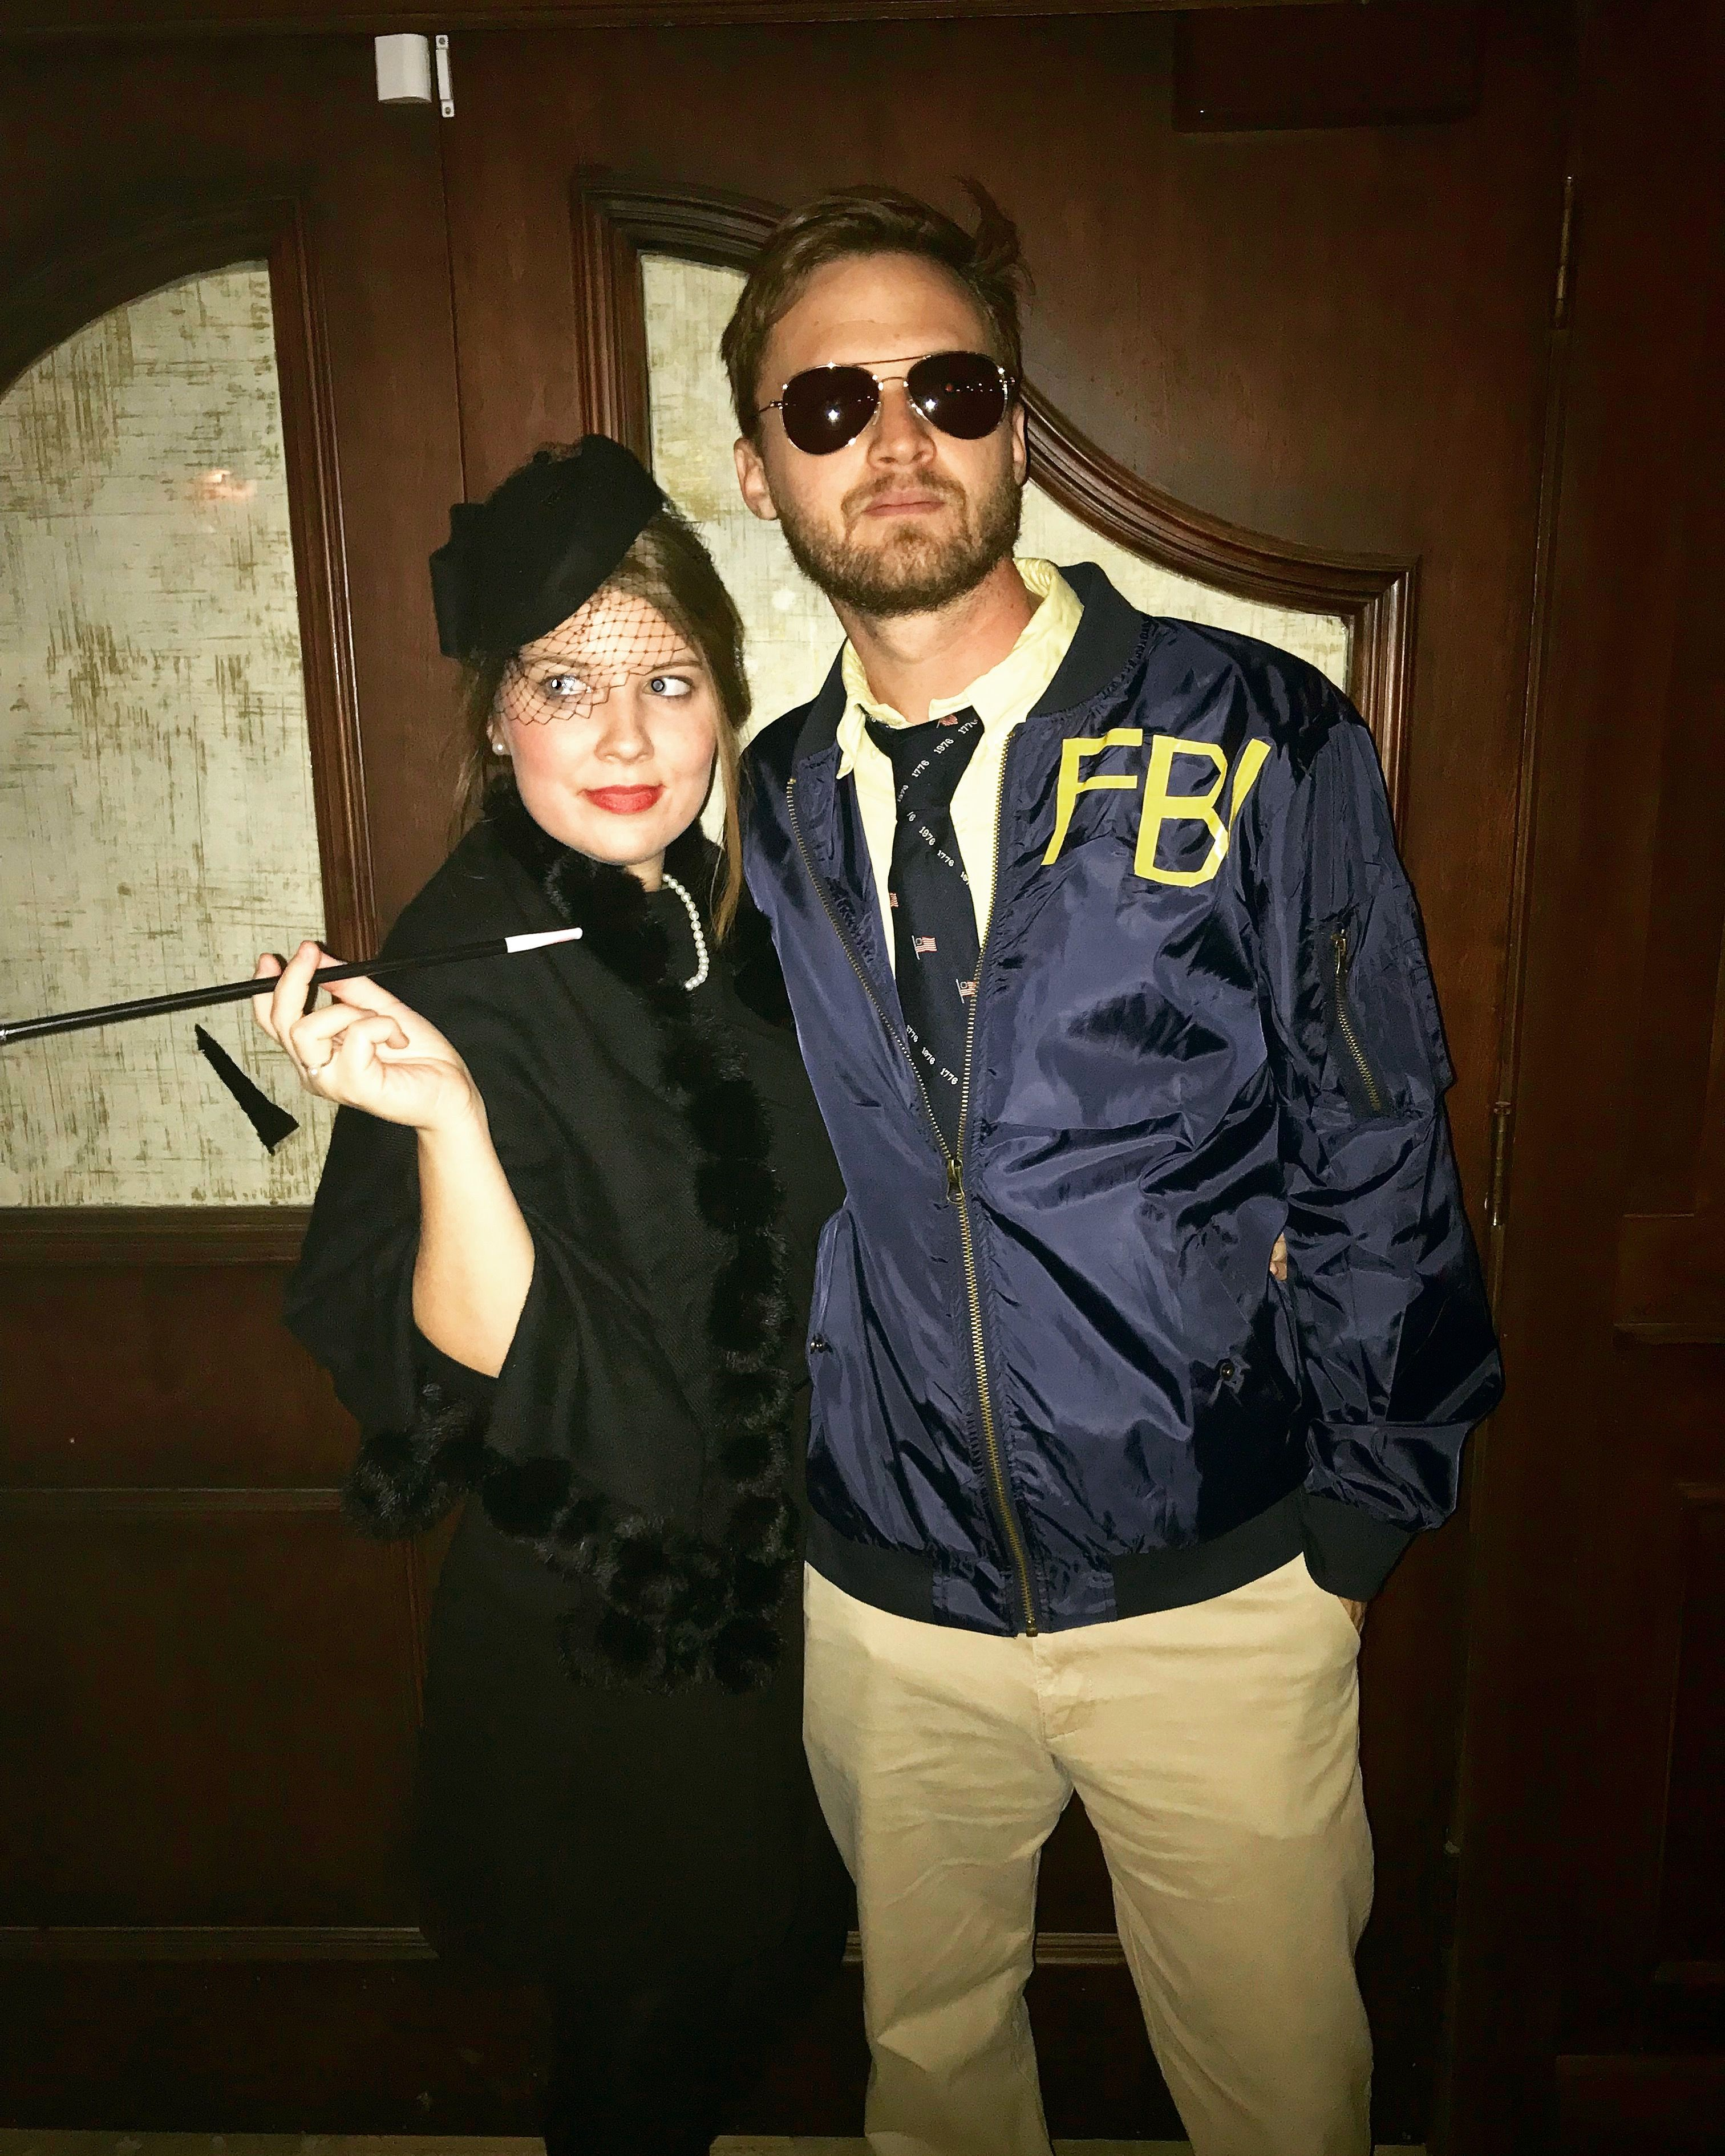 Janet Snakehole And Burt Macklin Couplescostumes Parksandrec Couples Costumes Janet Snakehole Bomber Jacket